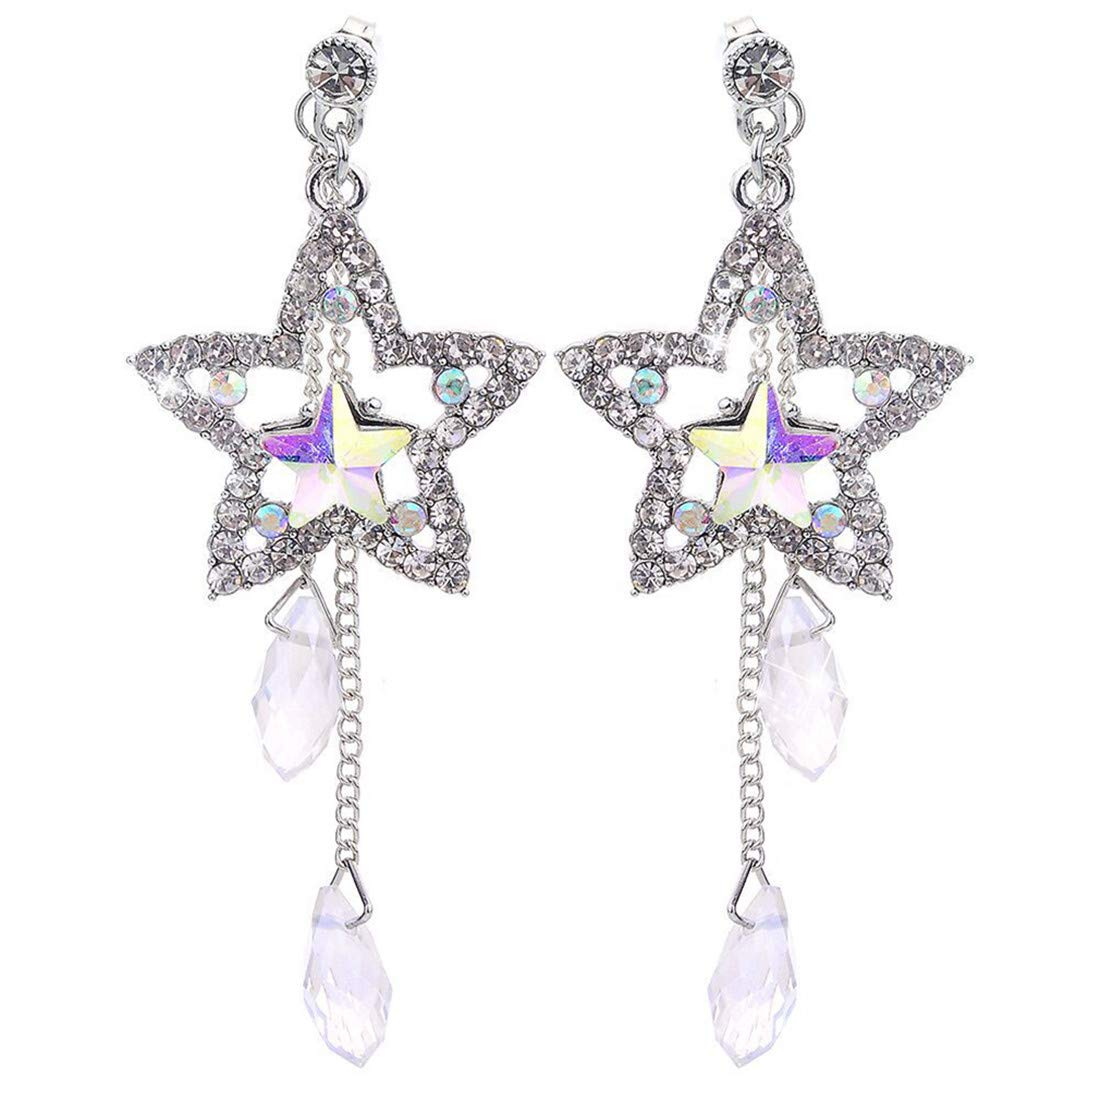 VWH Crystal Long Chain Earrings Pentagram Earrings Set for Women Engagement Wedding Jewelry Gifts